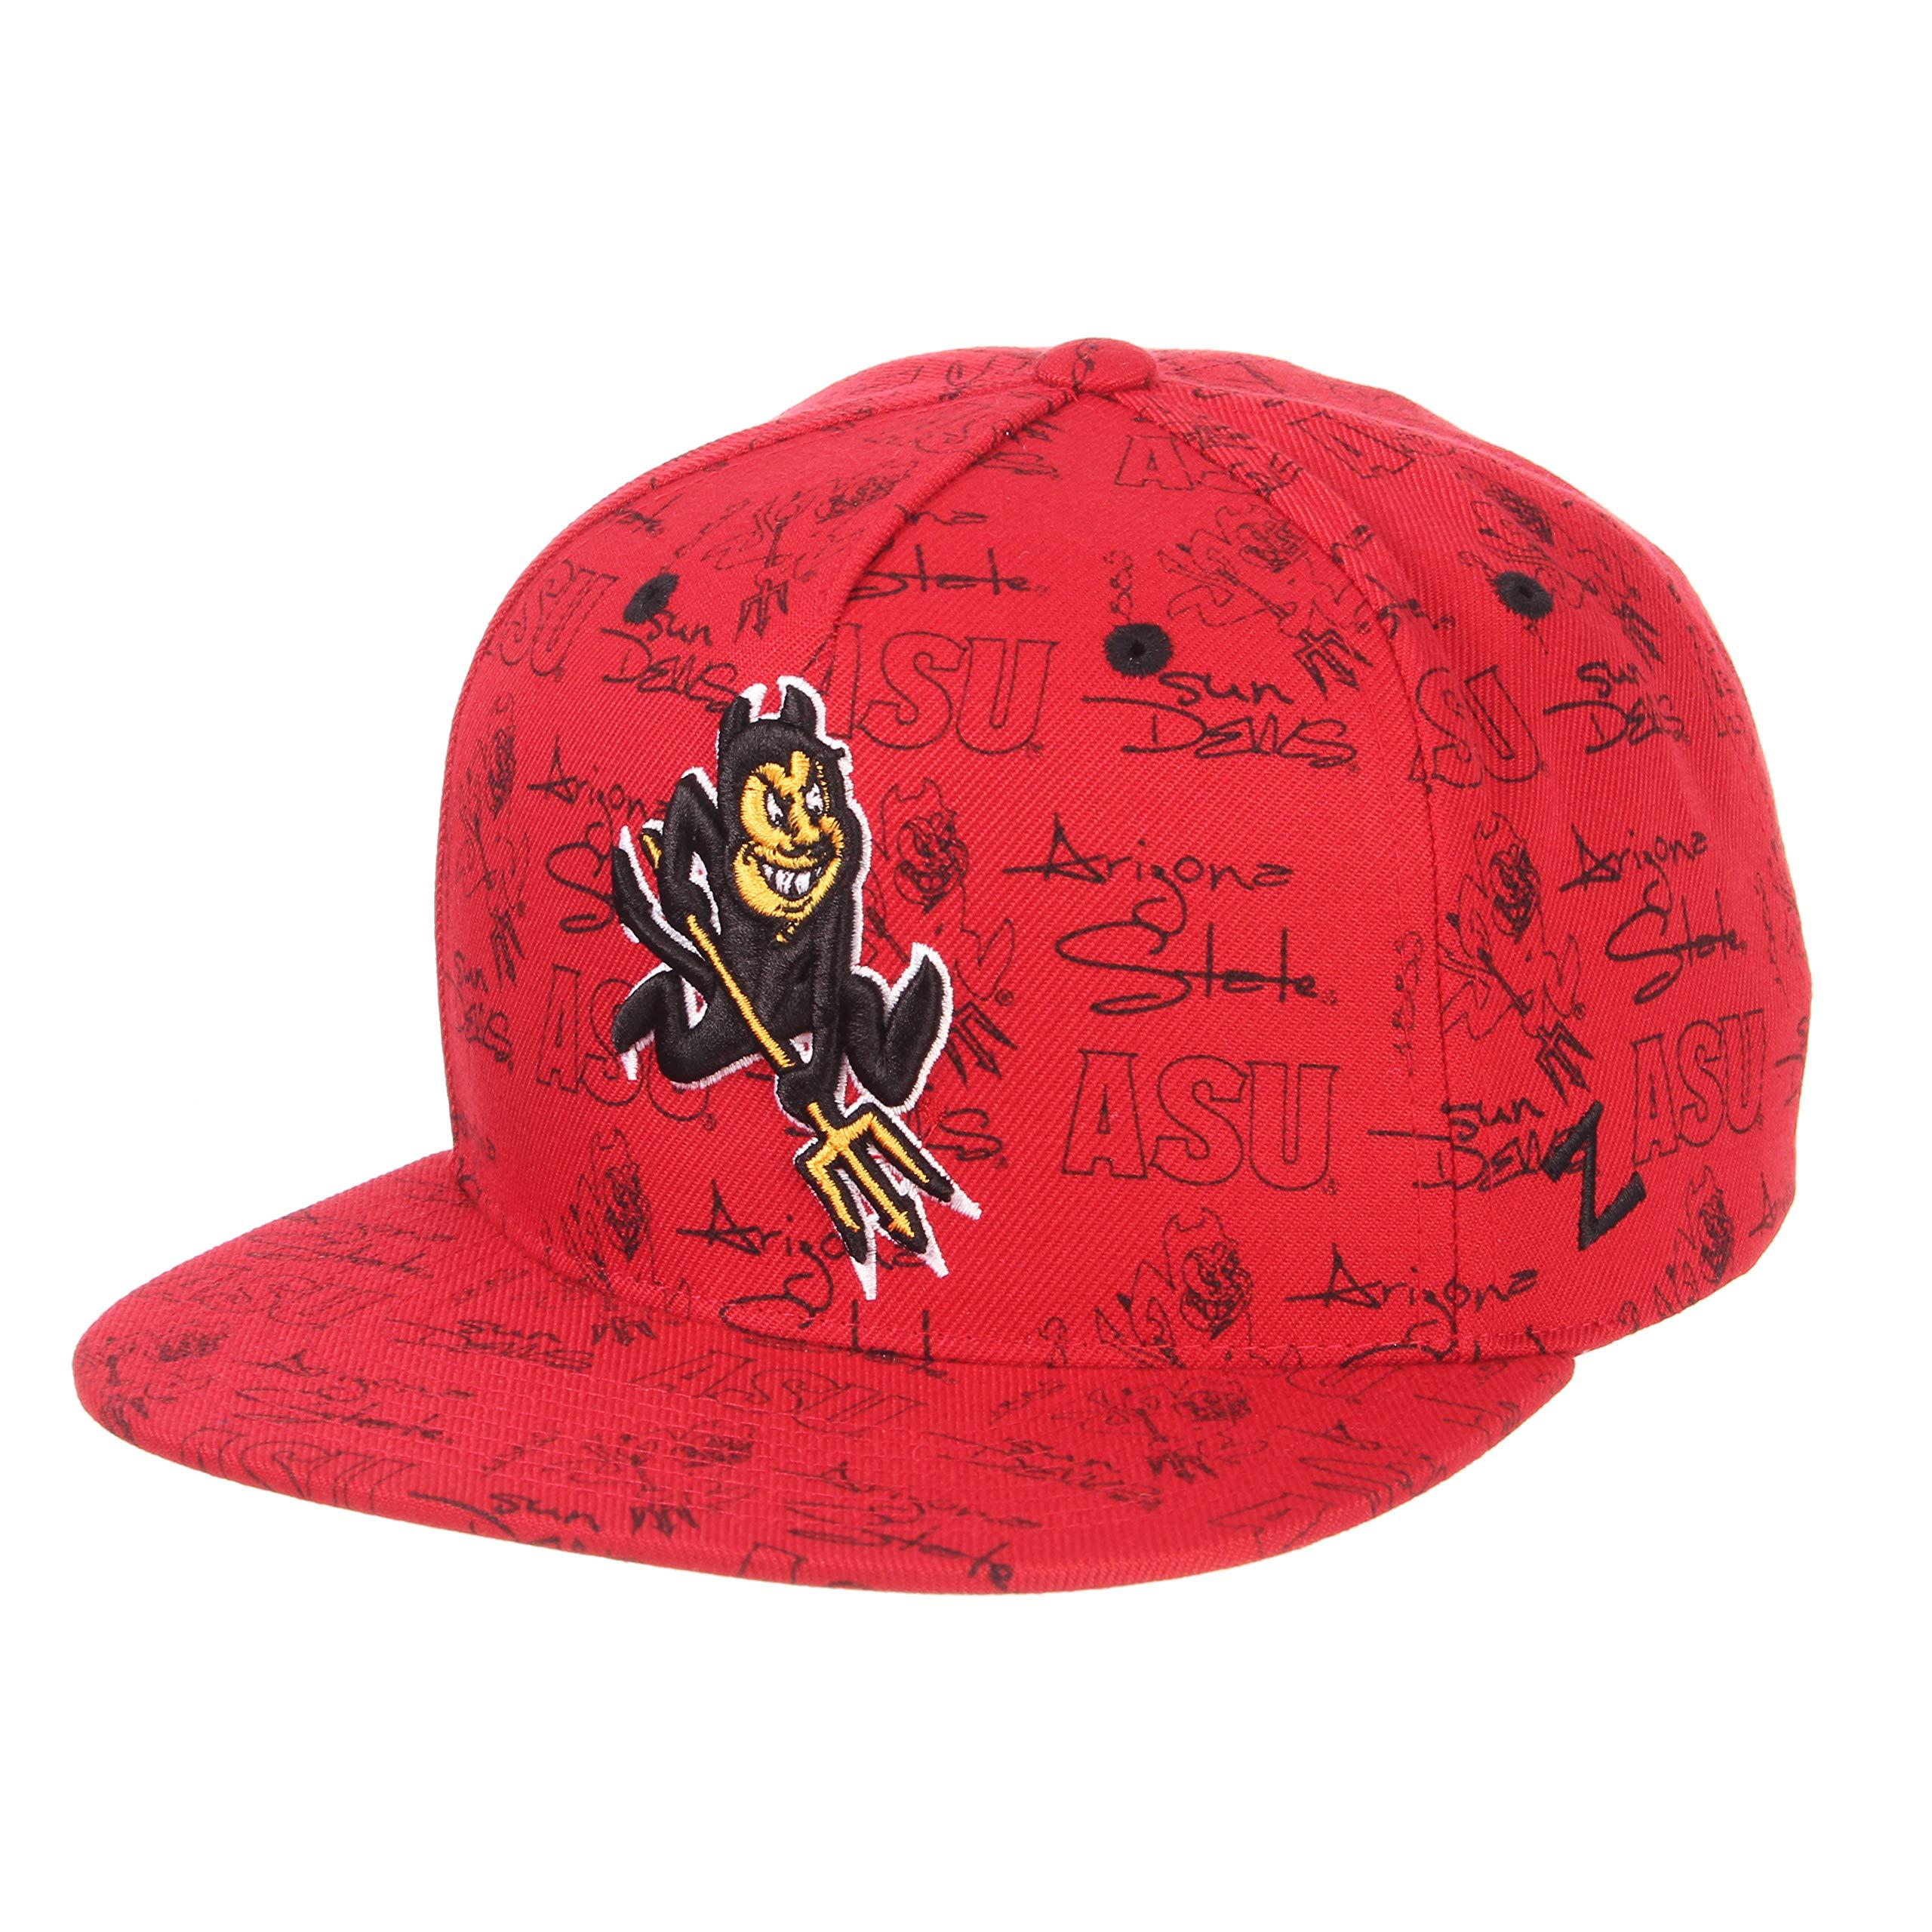 049616ed9dffe ZHATS NCAA Arizona State Sun Devils Men s Manic Snapback Hat ...